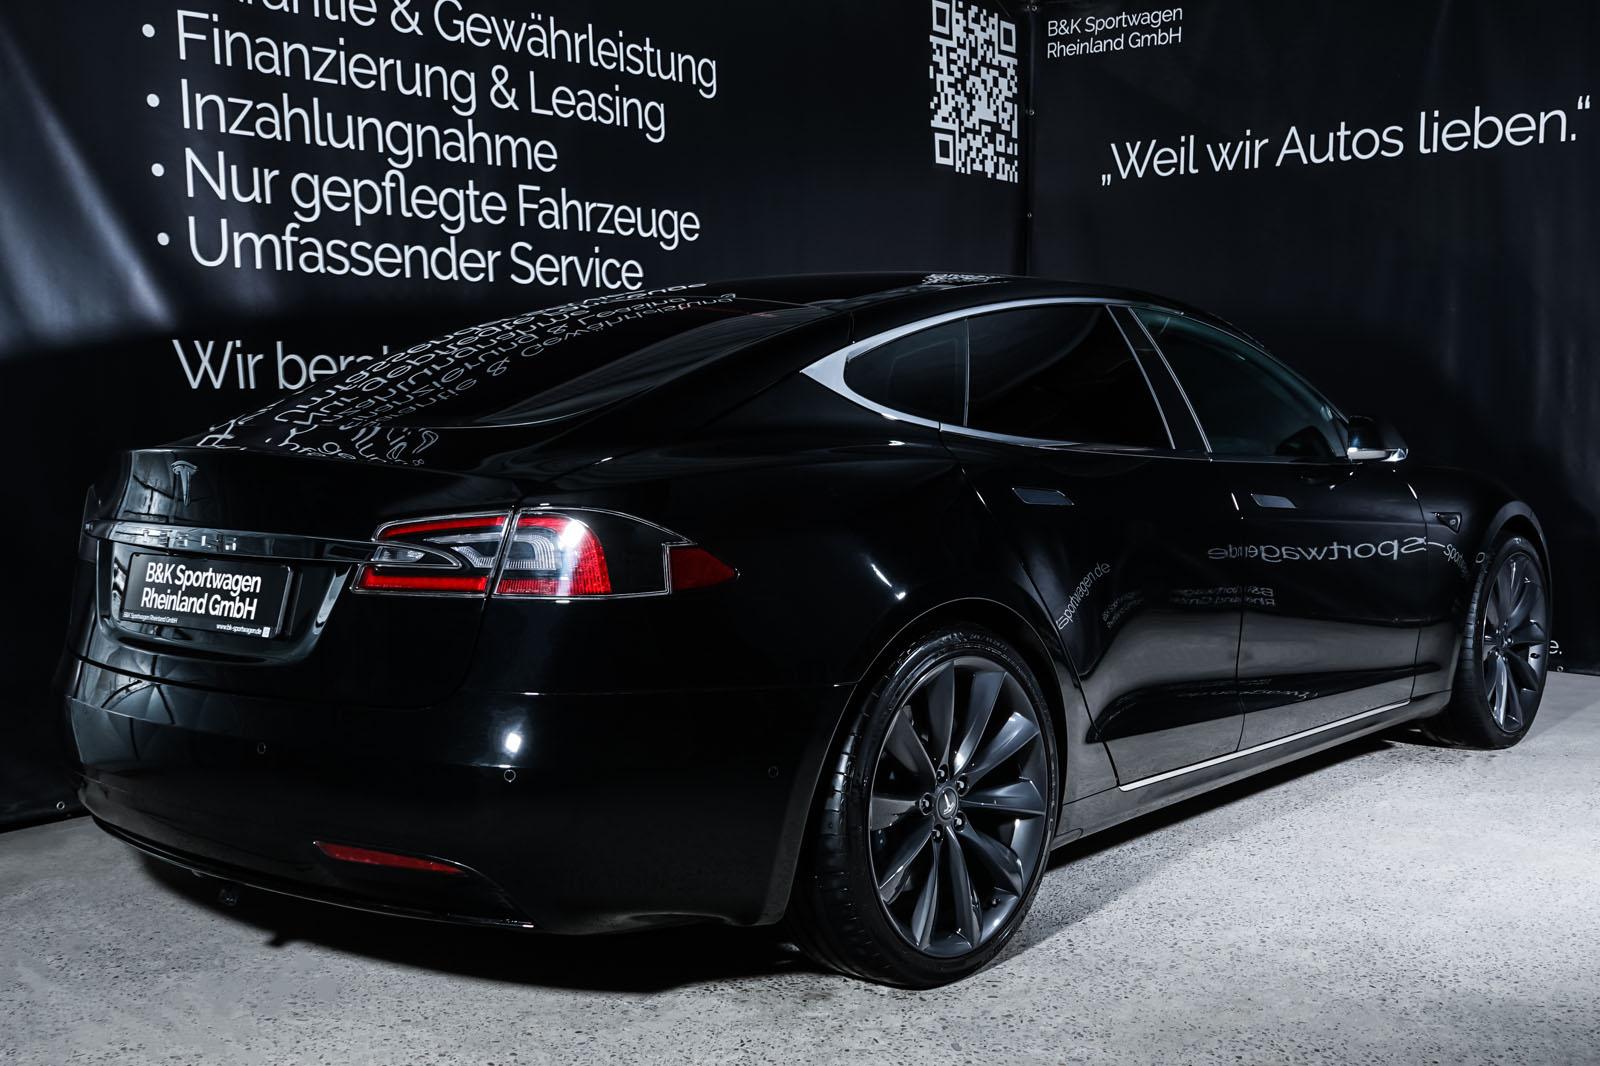 Tesla_ModelS_Schwarz_Schwarz_TES-6166_14_w